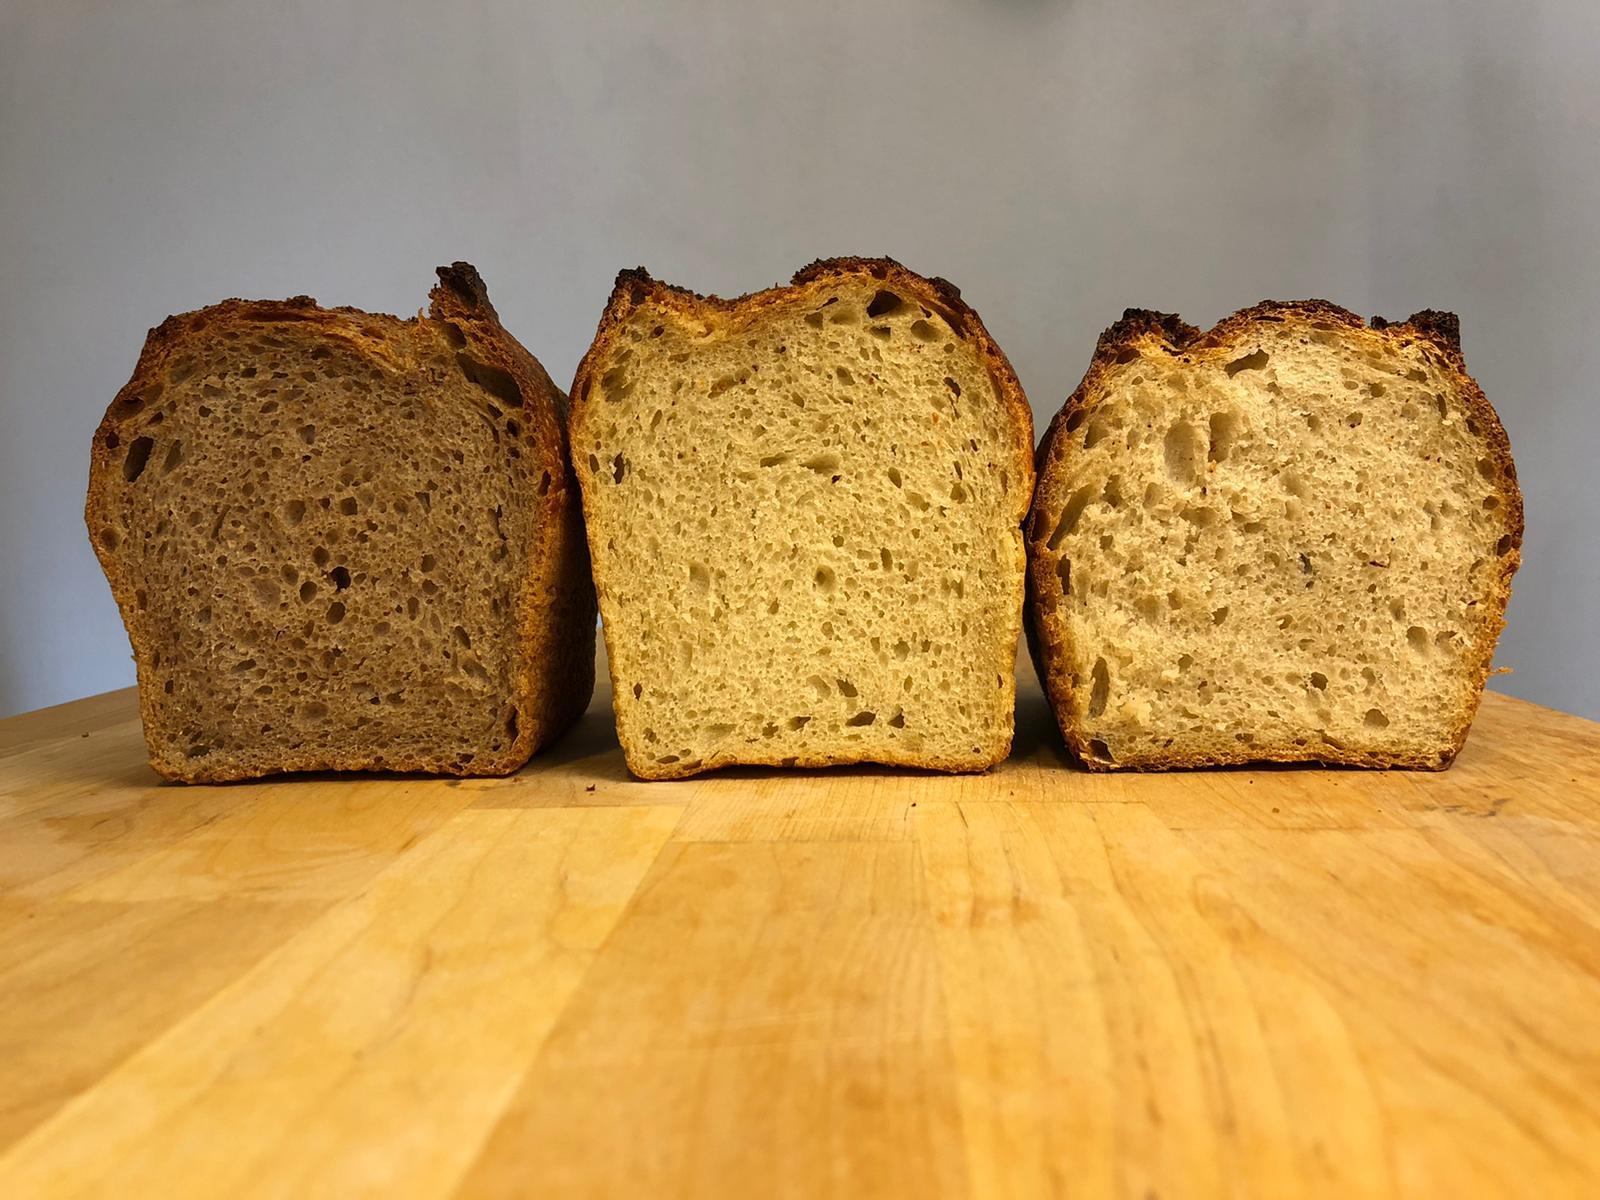 Rețetă de pâine de casă cu maia, à la Tom Rees, patiser boulanger Pain Plaisir